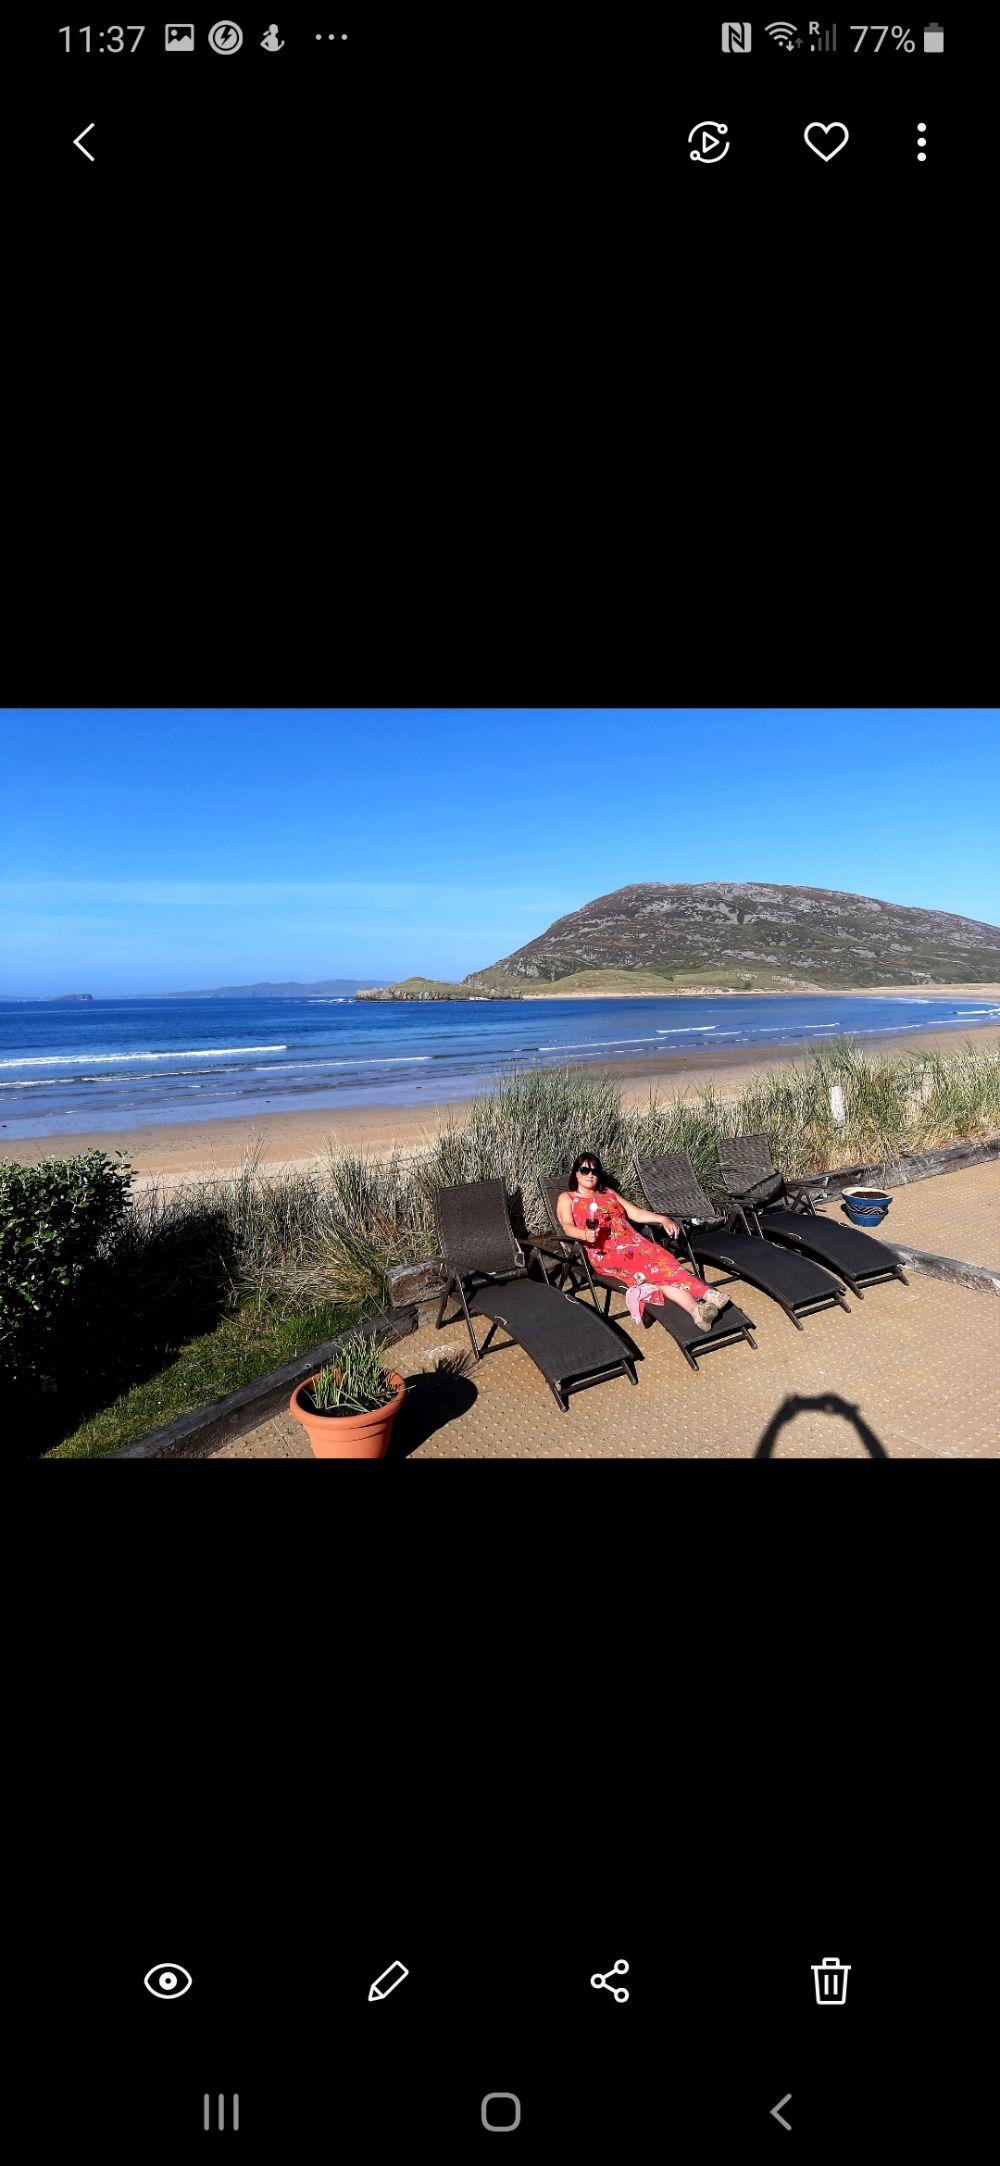 ONeills Beach House at Tullagh Bay